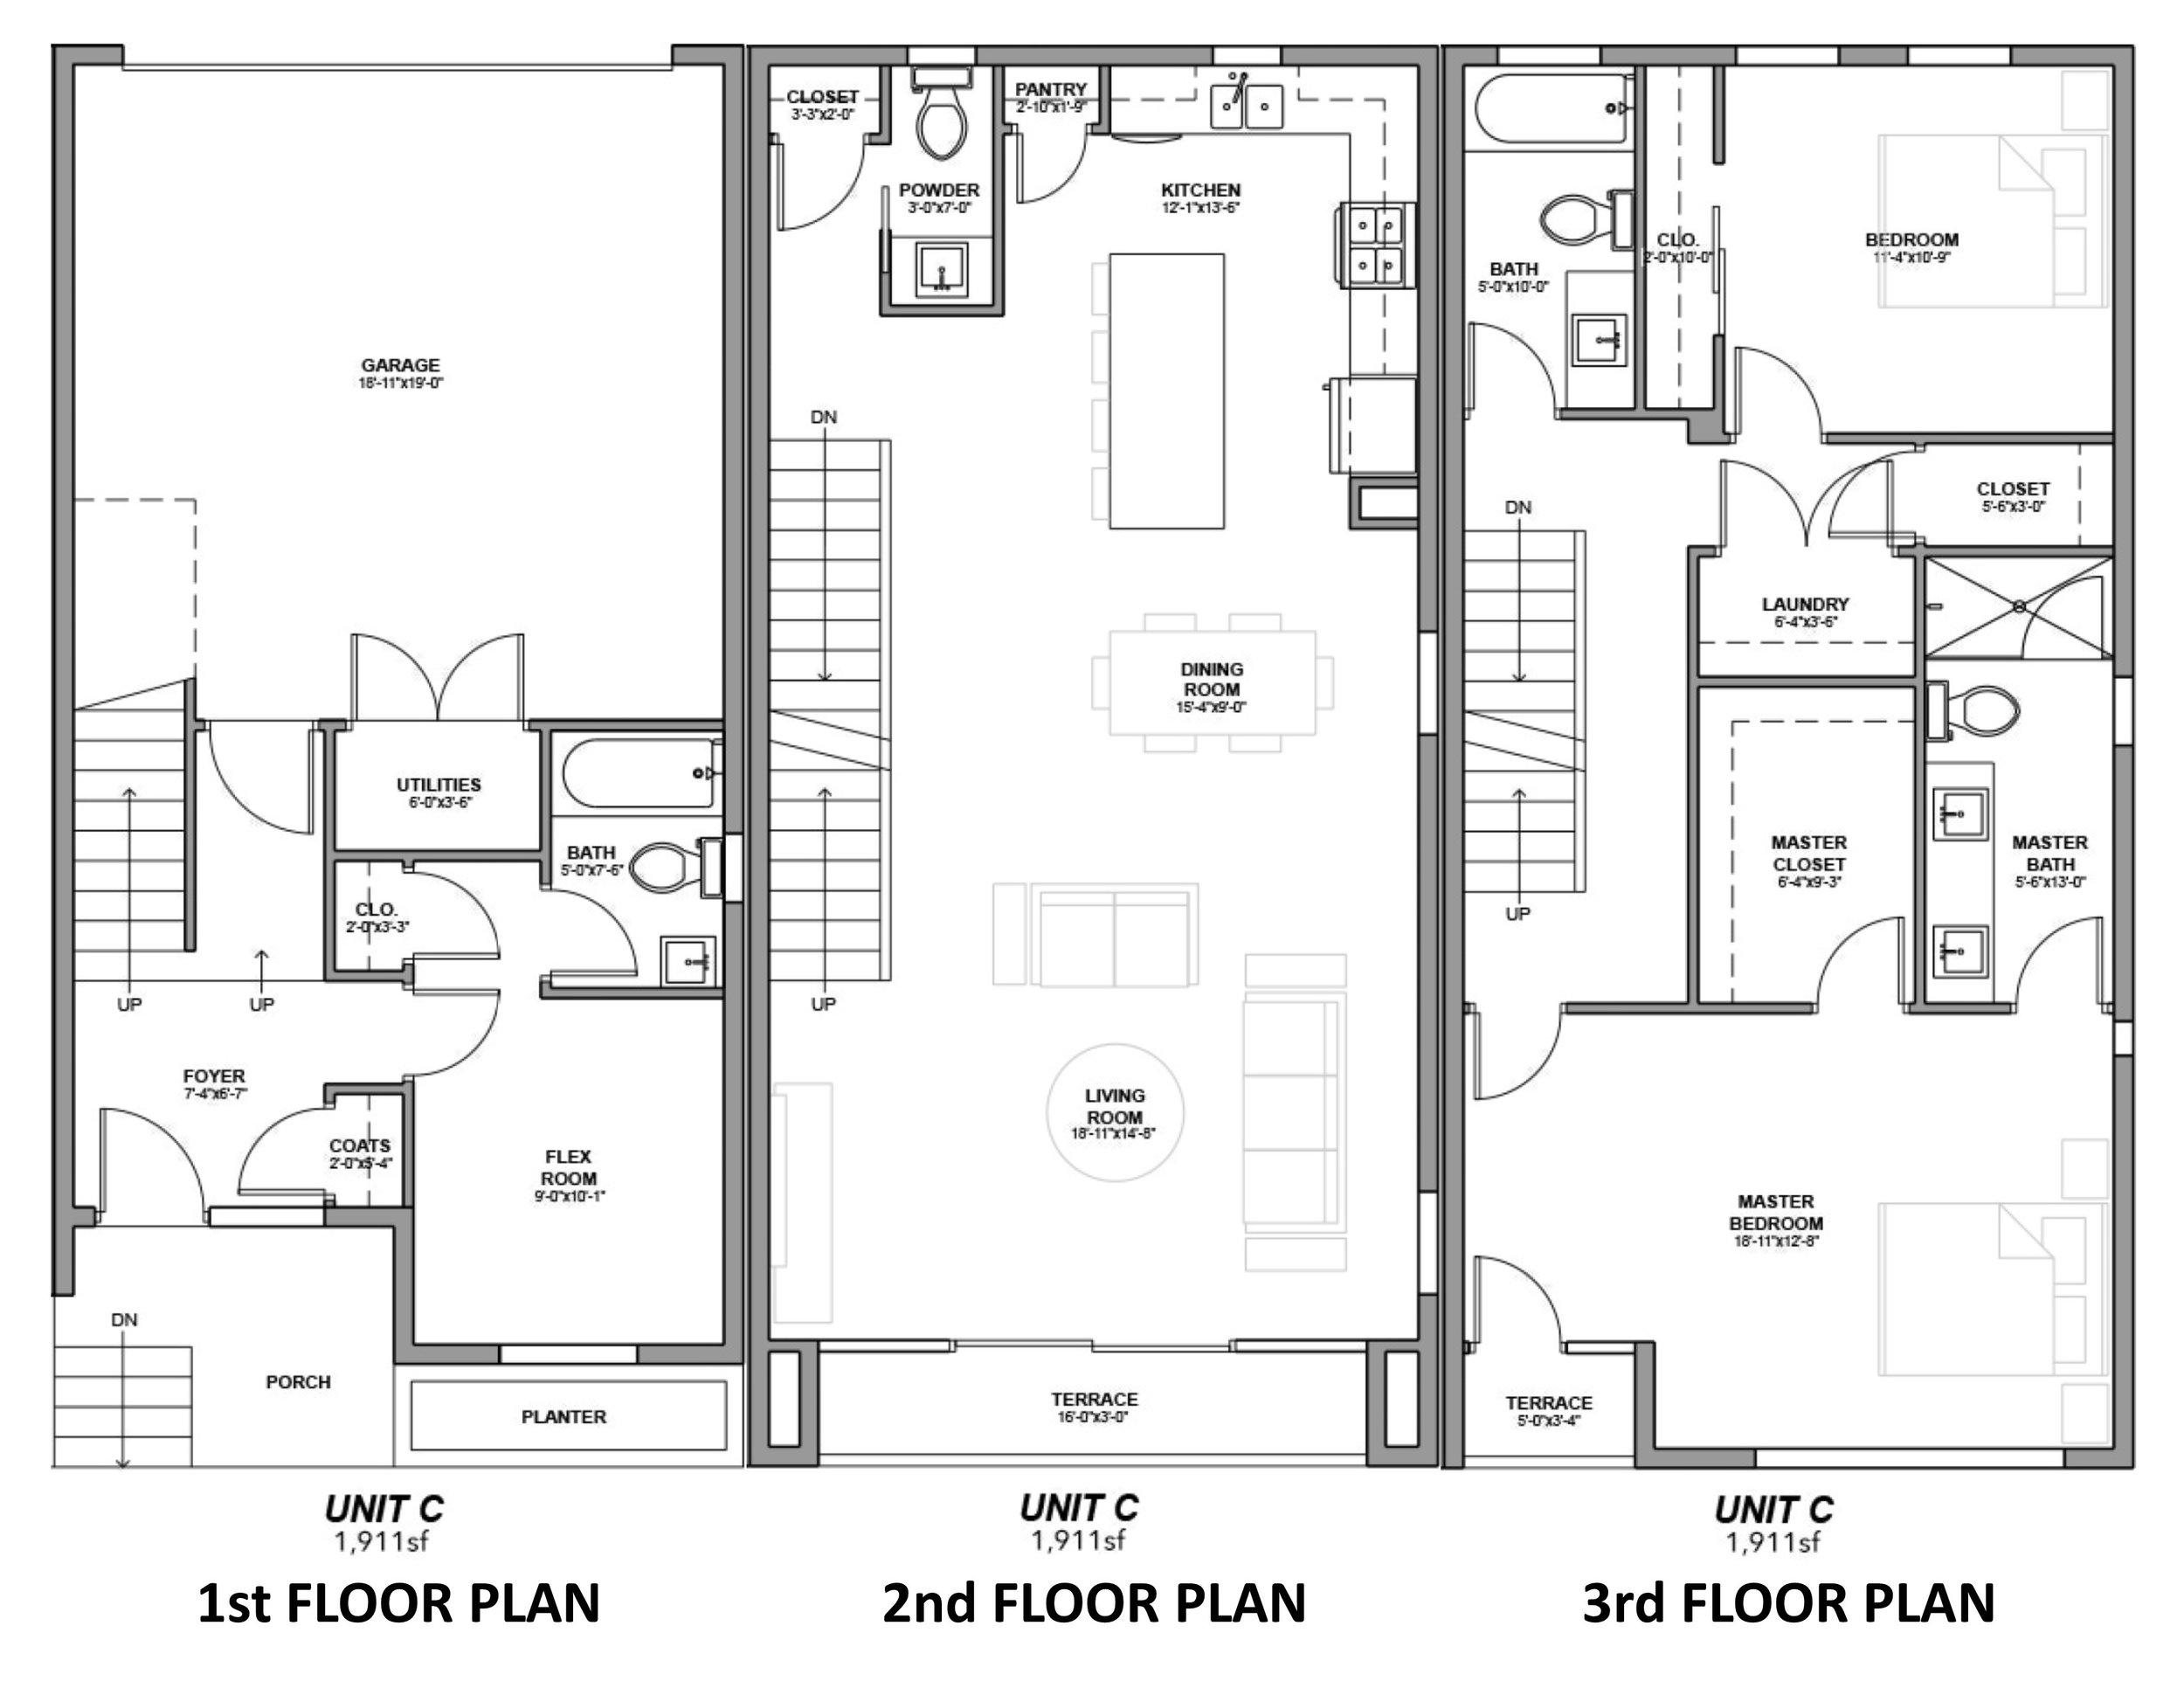 Floorplan Building 2 Unit C 408 Jefferson.jpg